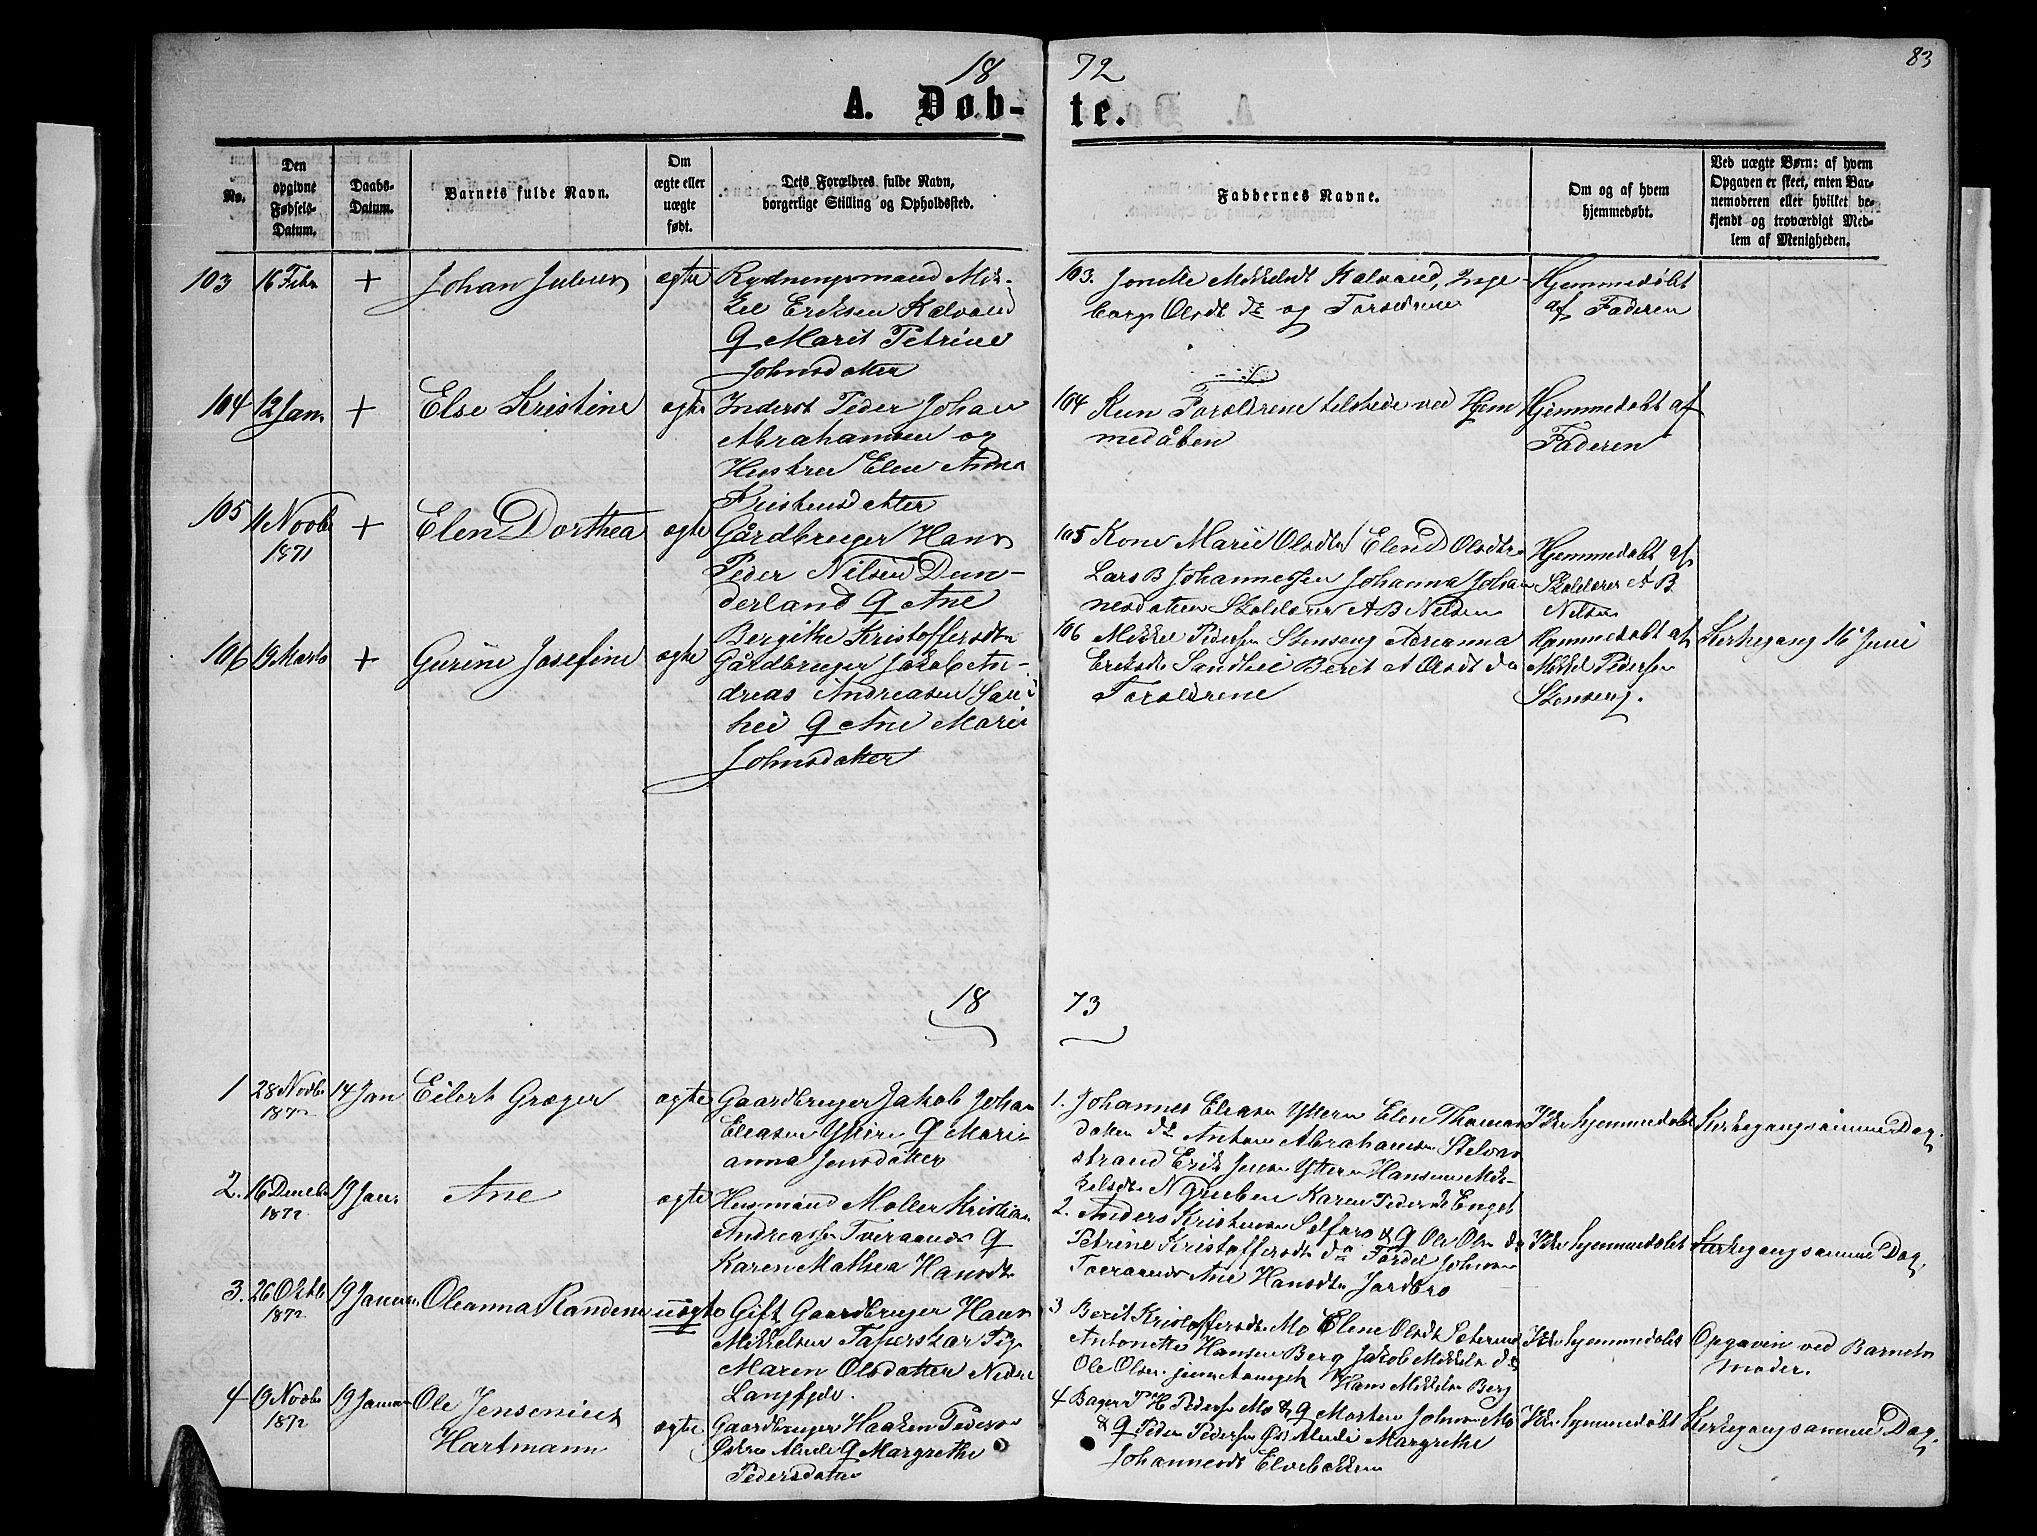 SAT, Ministerialprotokoller, klokkerbøker og fødselsregistre - Nordland, 827/L0415: Klokkerbok nr. 827C04, 1864-1886, s. 83